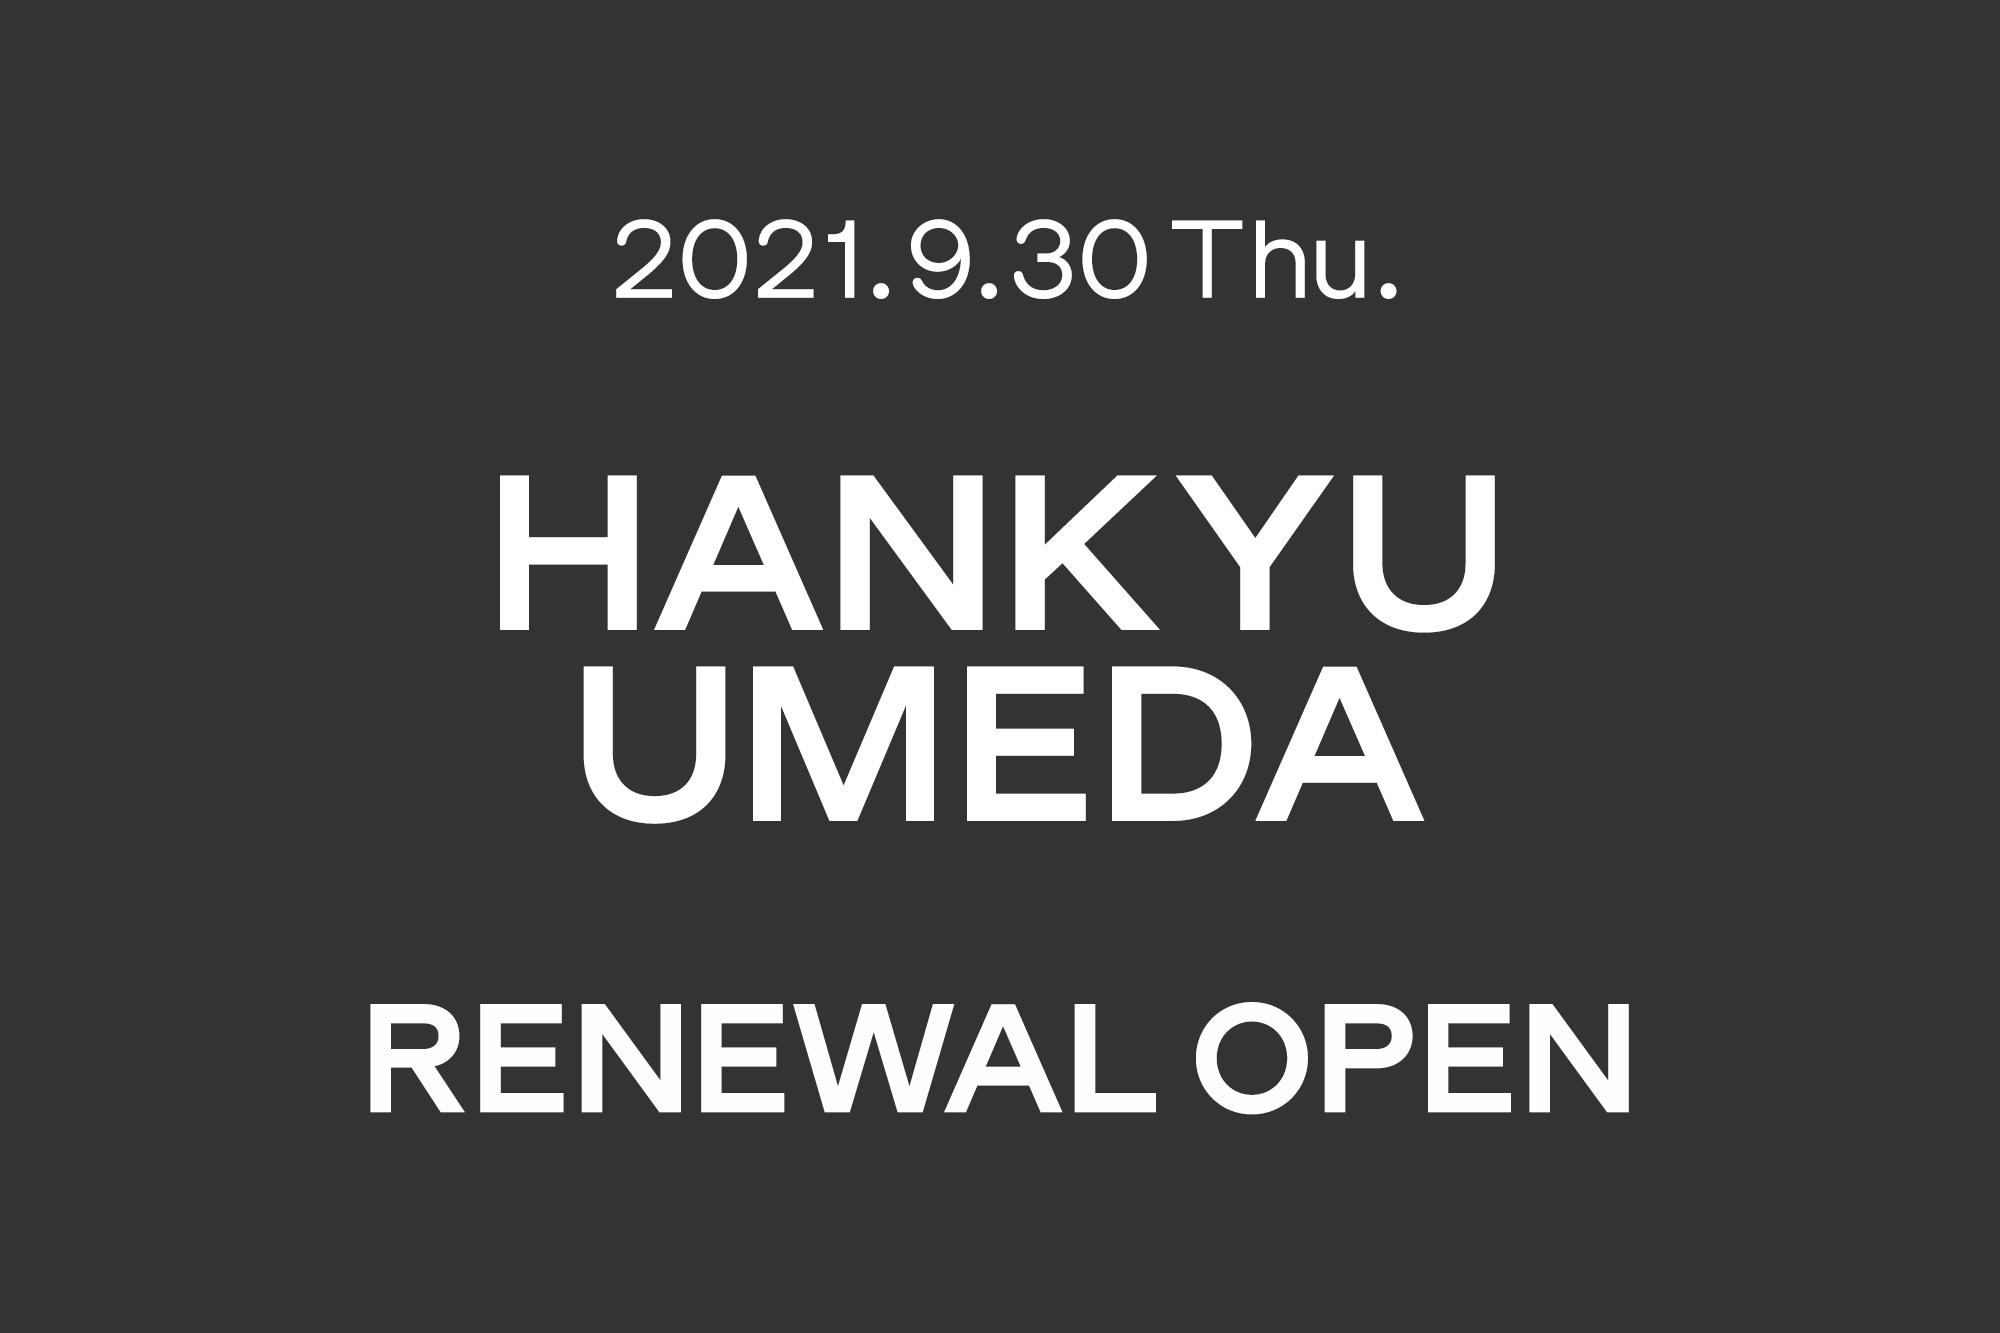 Marimekko 阪急うめだ本店 ラインナップ拡大のお知らせ